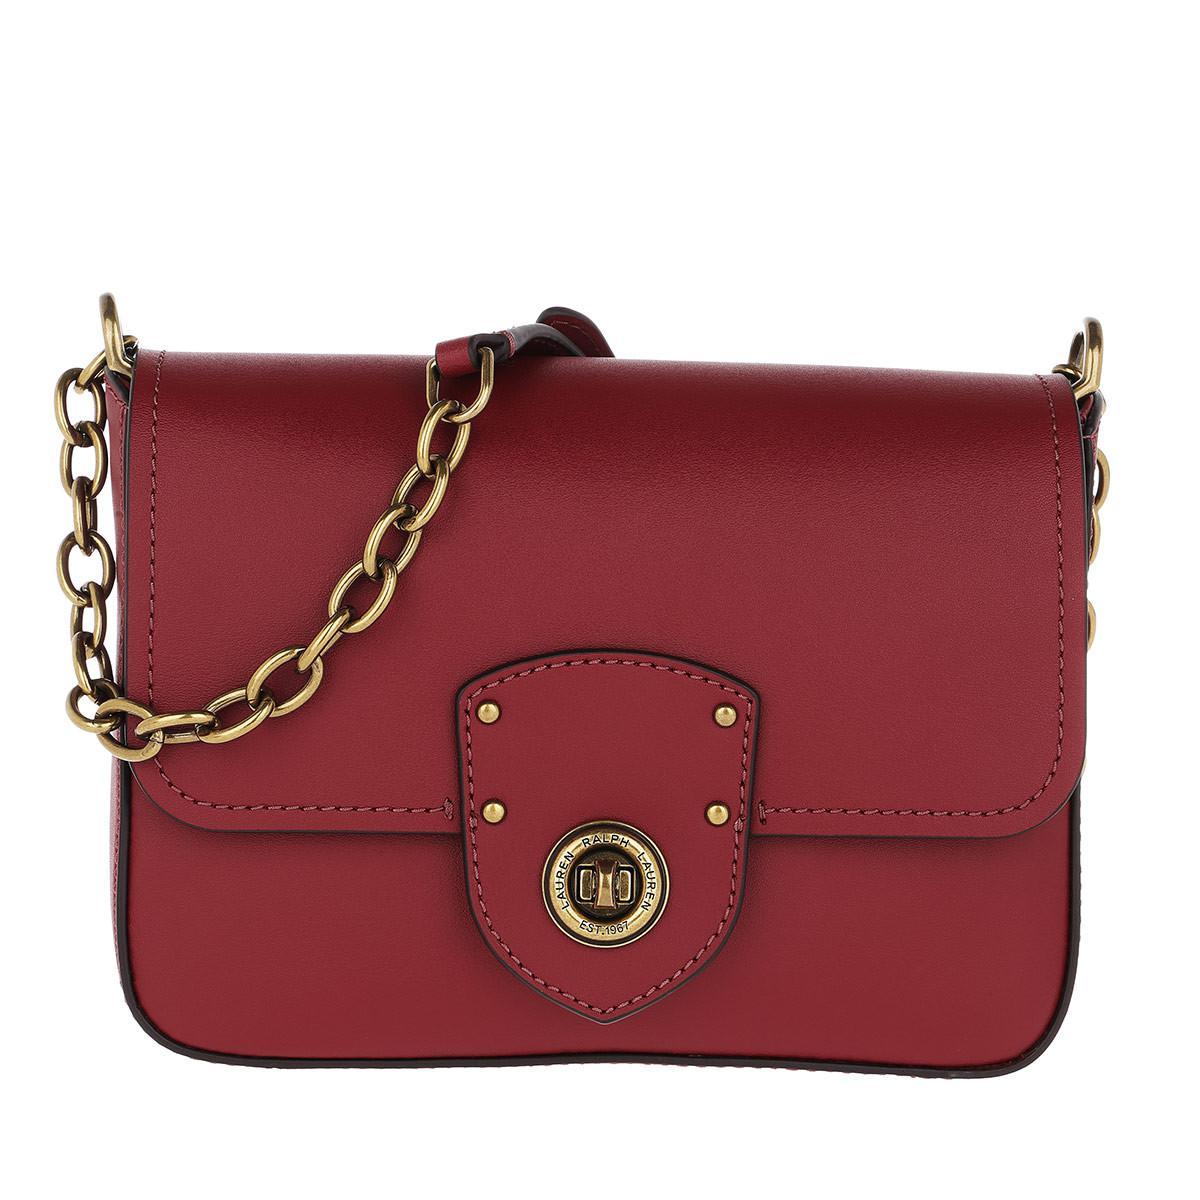 33e2f9d8c3 Lauren by Ralph Lauren Millbrook Crossbody Bag Smooth Leather Red in ...